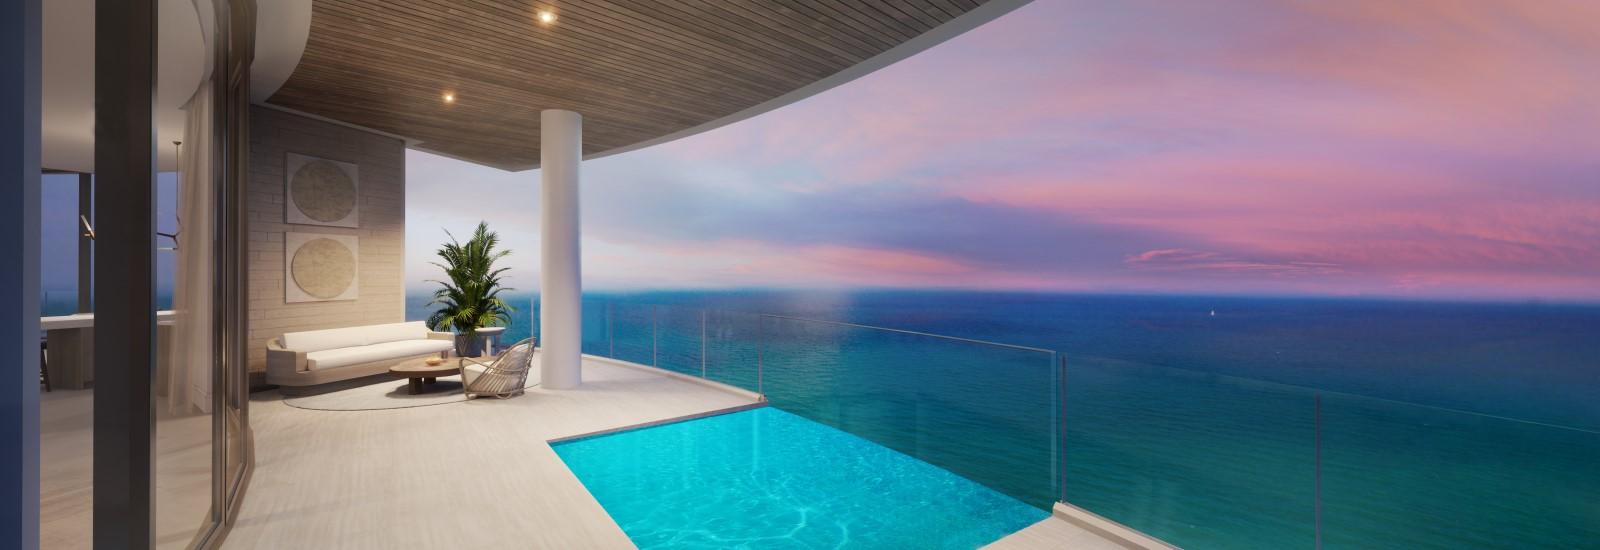 4-the-residences-at-the-st-regis-longboat-key-balcony.jpg